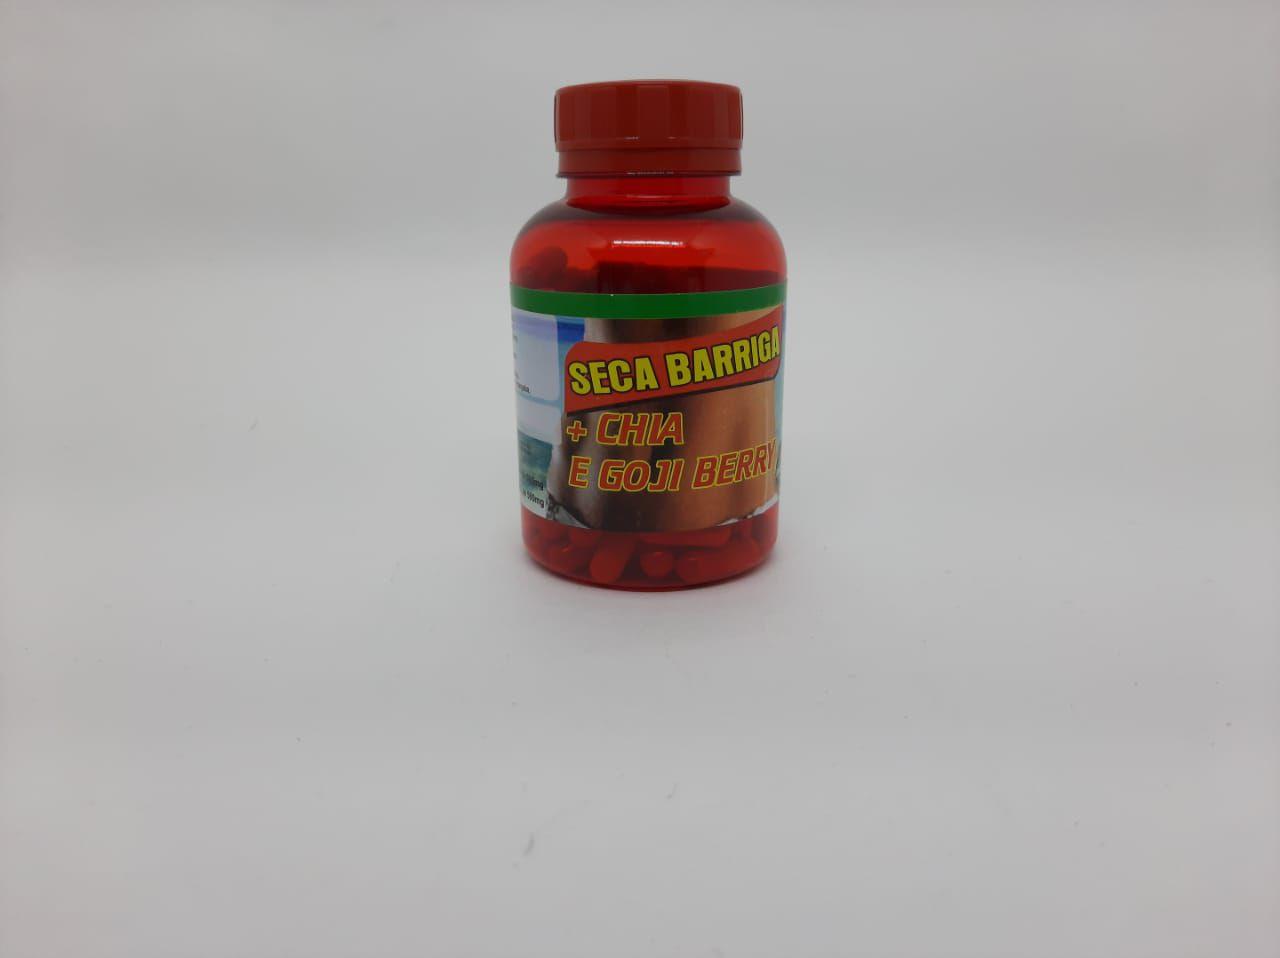 Seca Barriga + Chia e Goji Berry